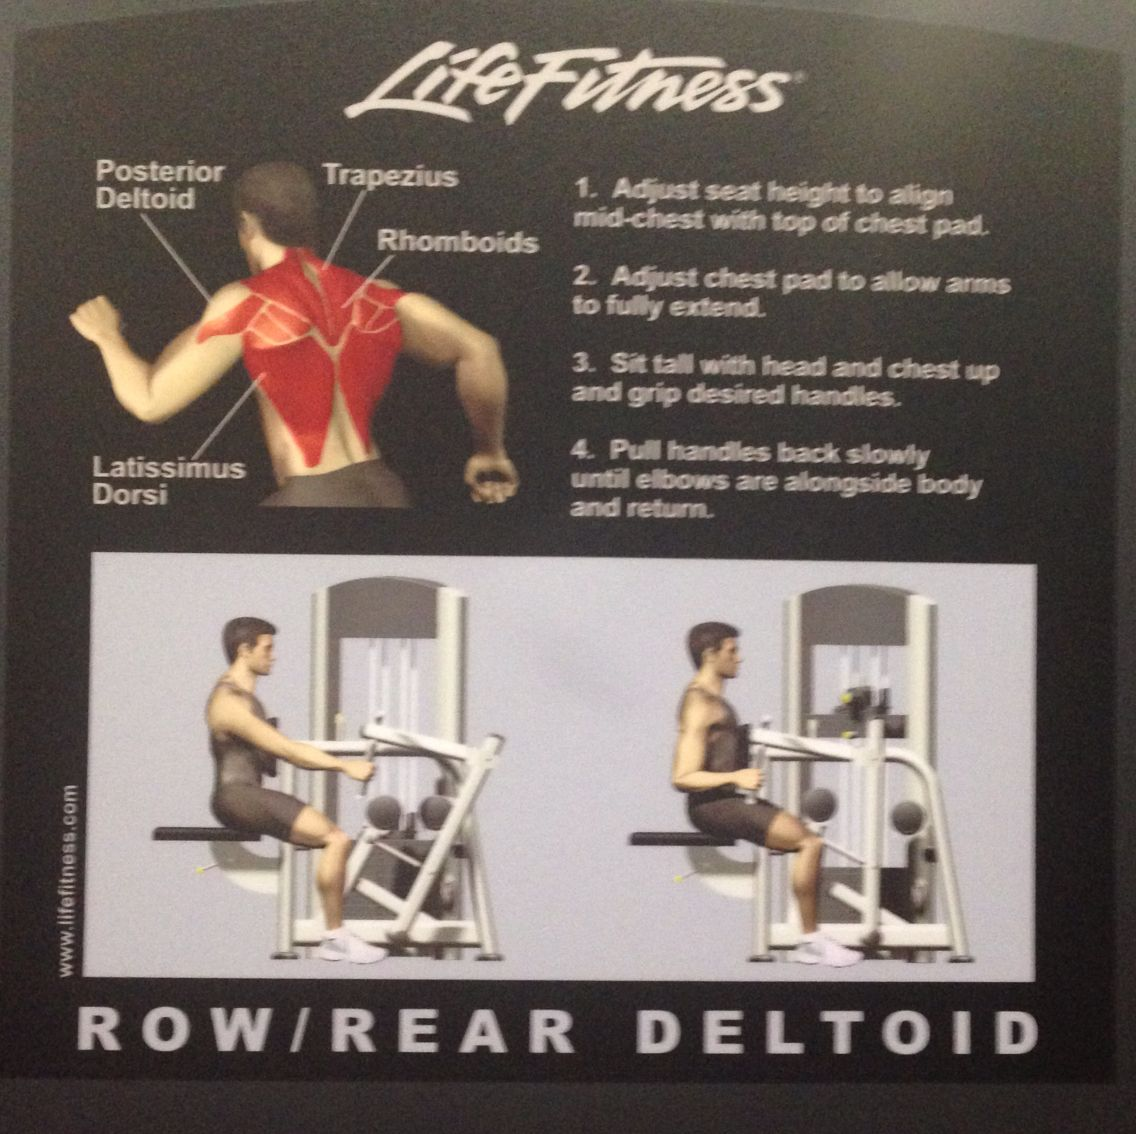 Machine Planet Fitness Workout Get Fit Deltoids